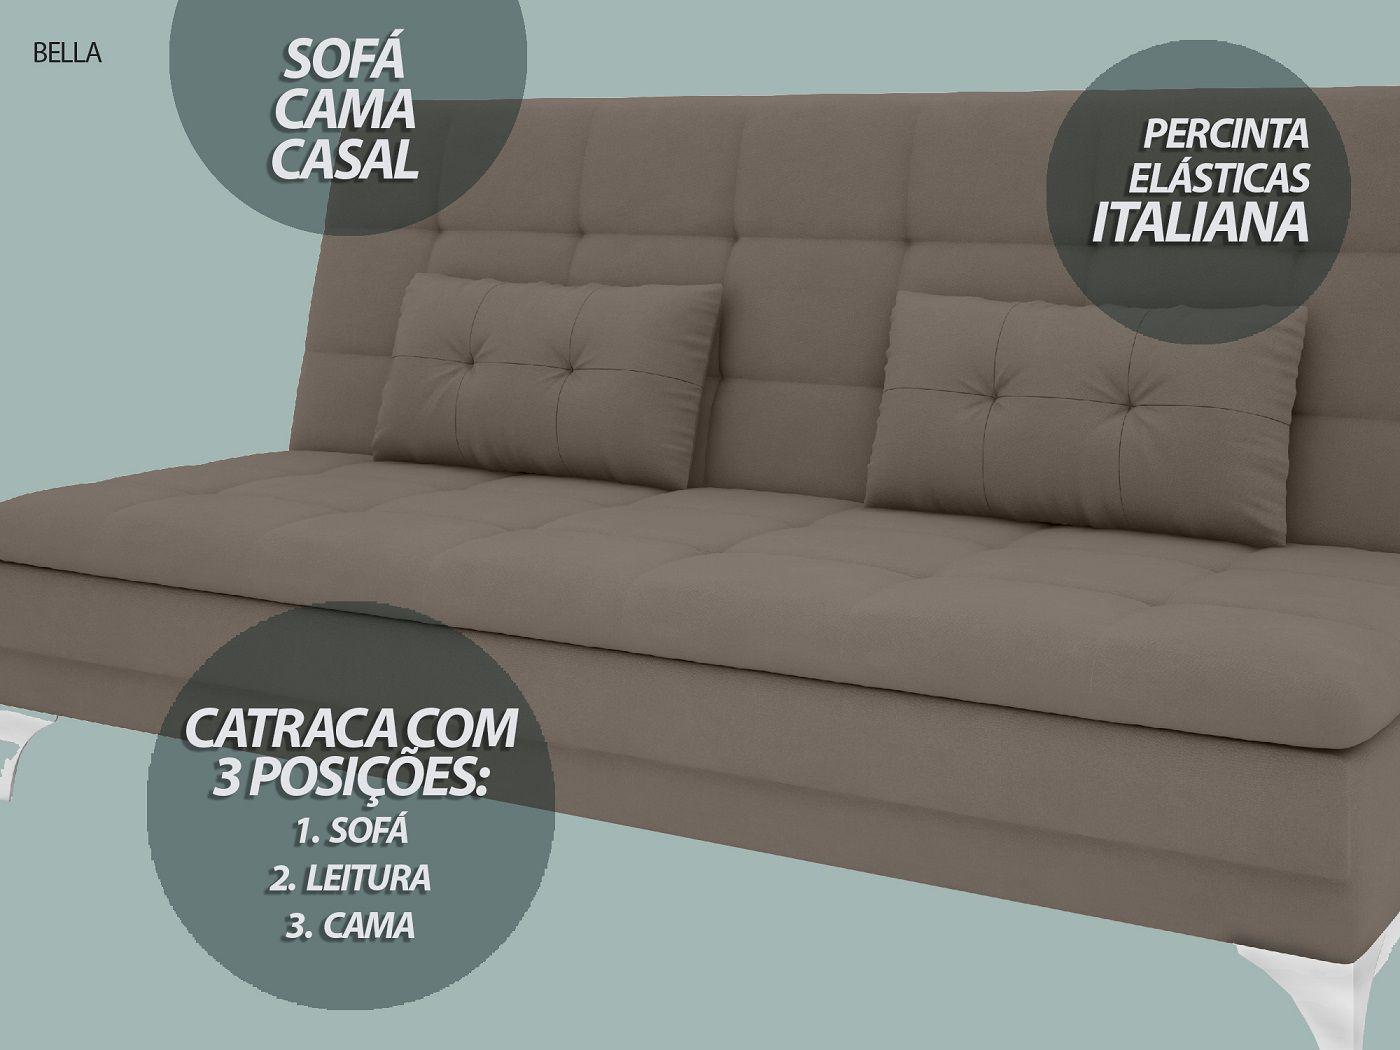 Sofá-Cama Casal New Bella 1,87m Velosuede Bege - NETSOFAS